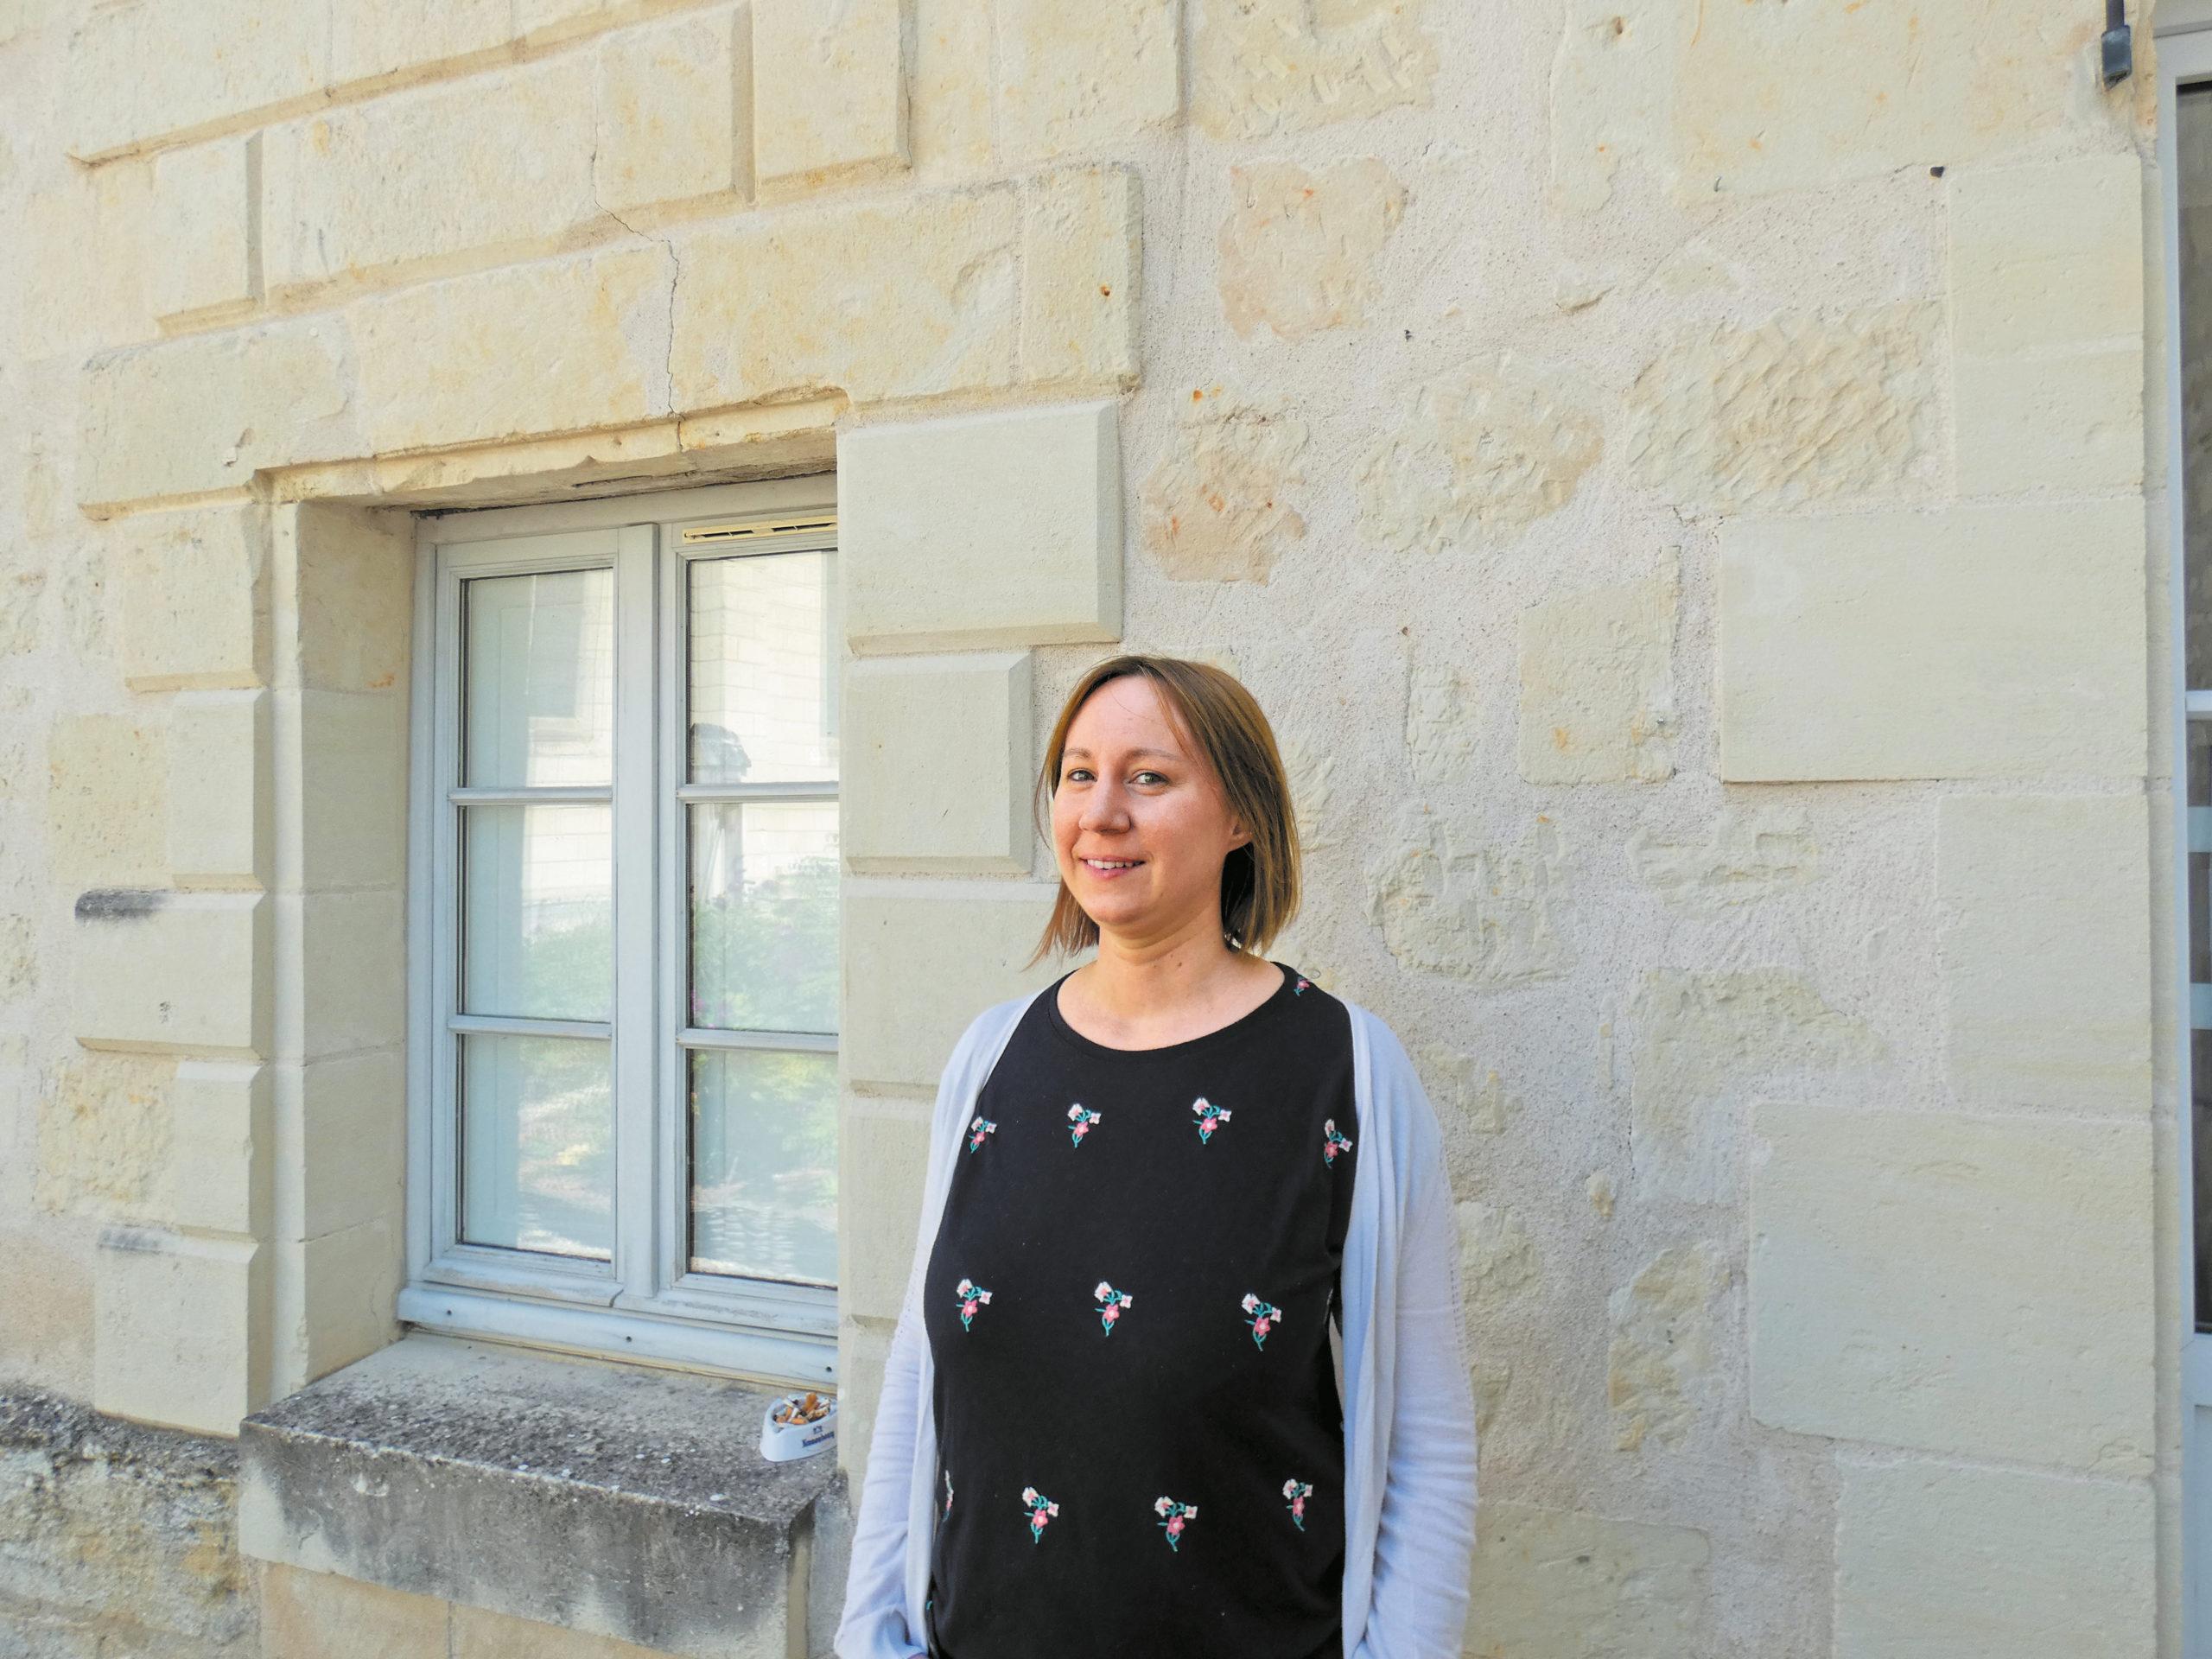 Céline Mercier chef de service au Village de Chinon